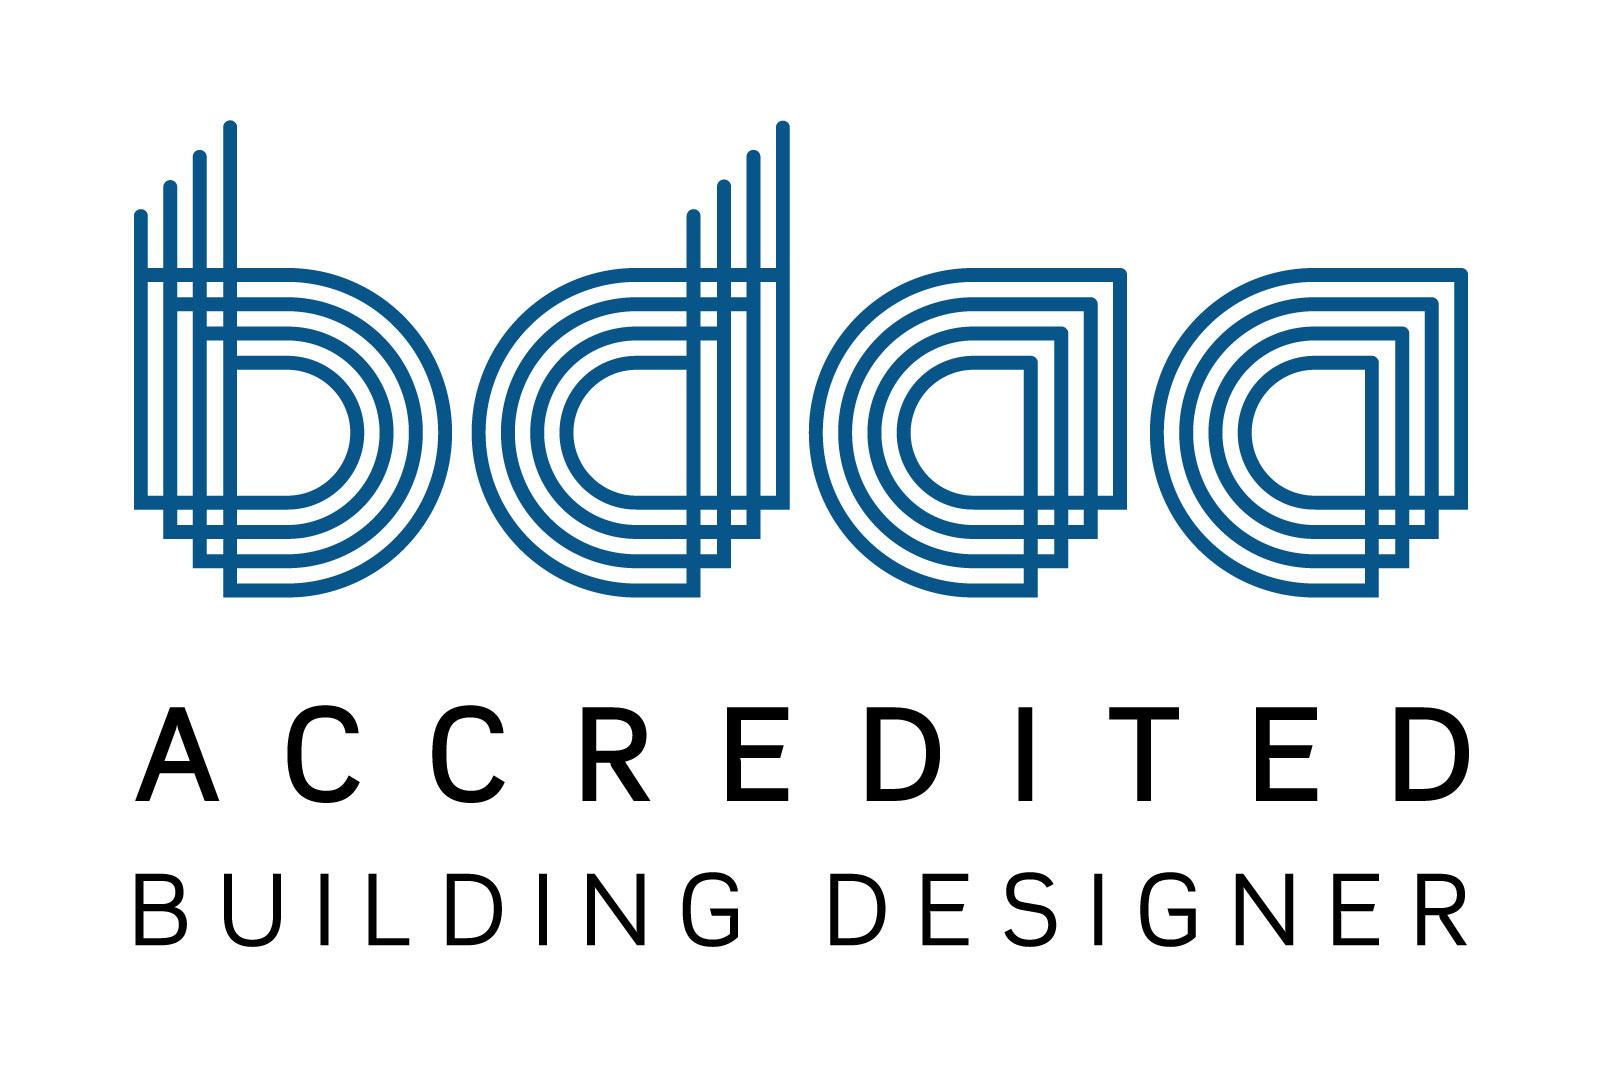 BDAA_accredited_positive_CMYK.jpg